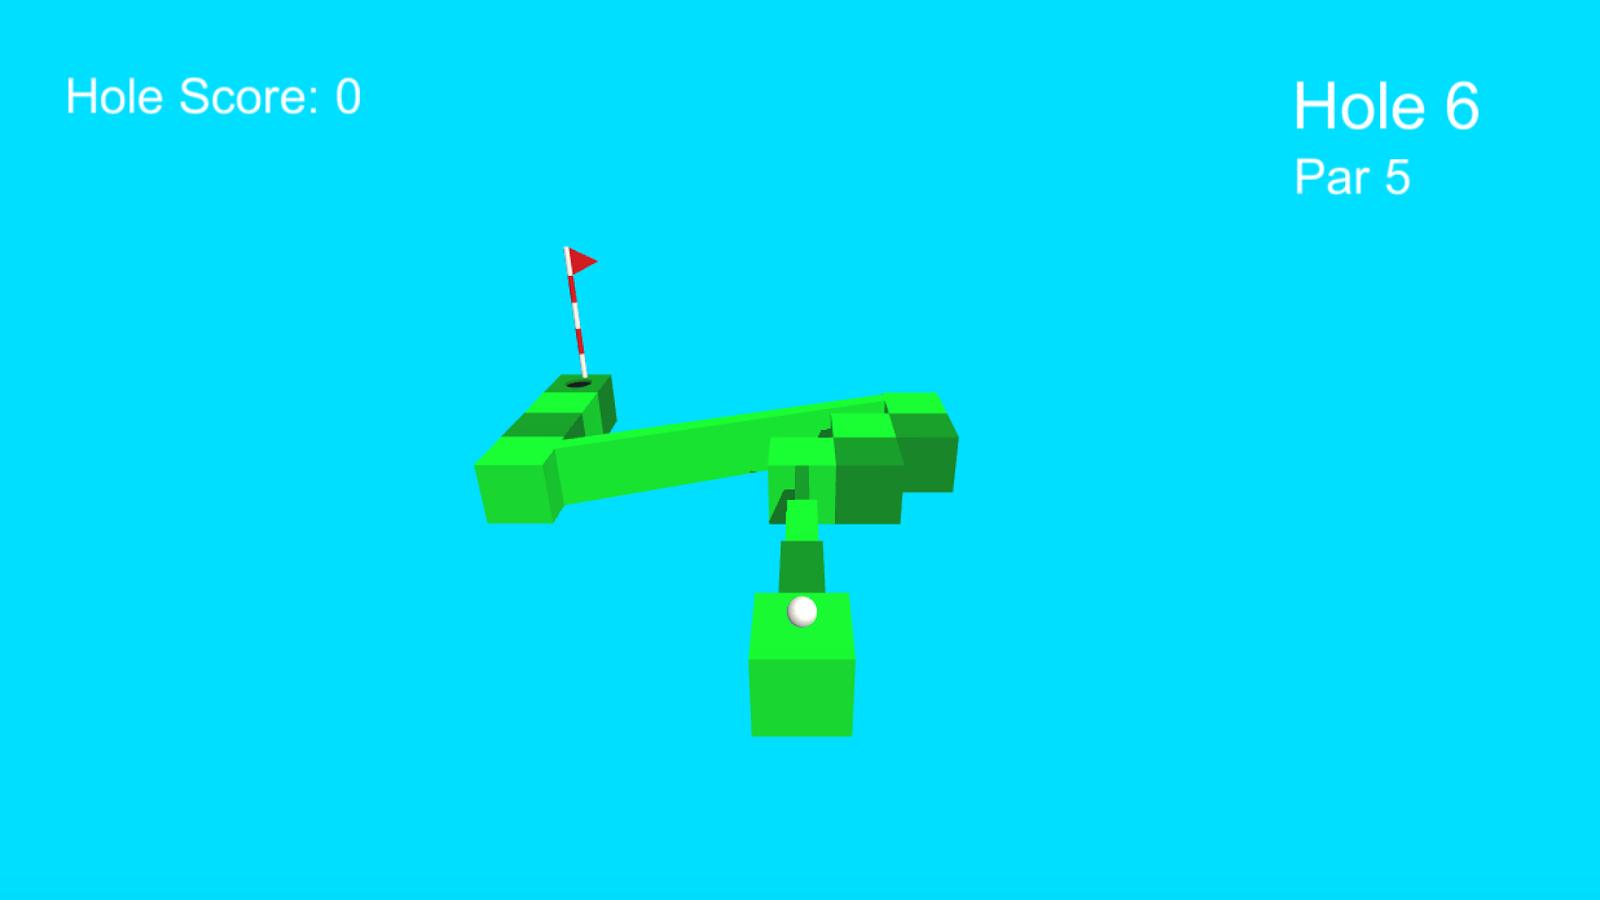 TipTap-Golf 22